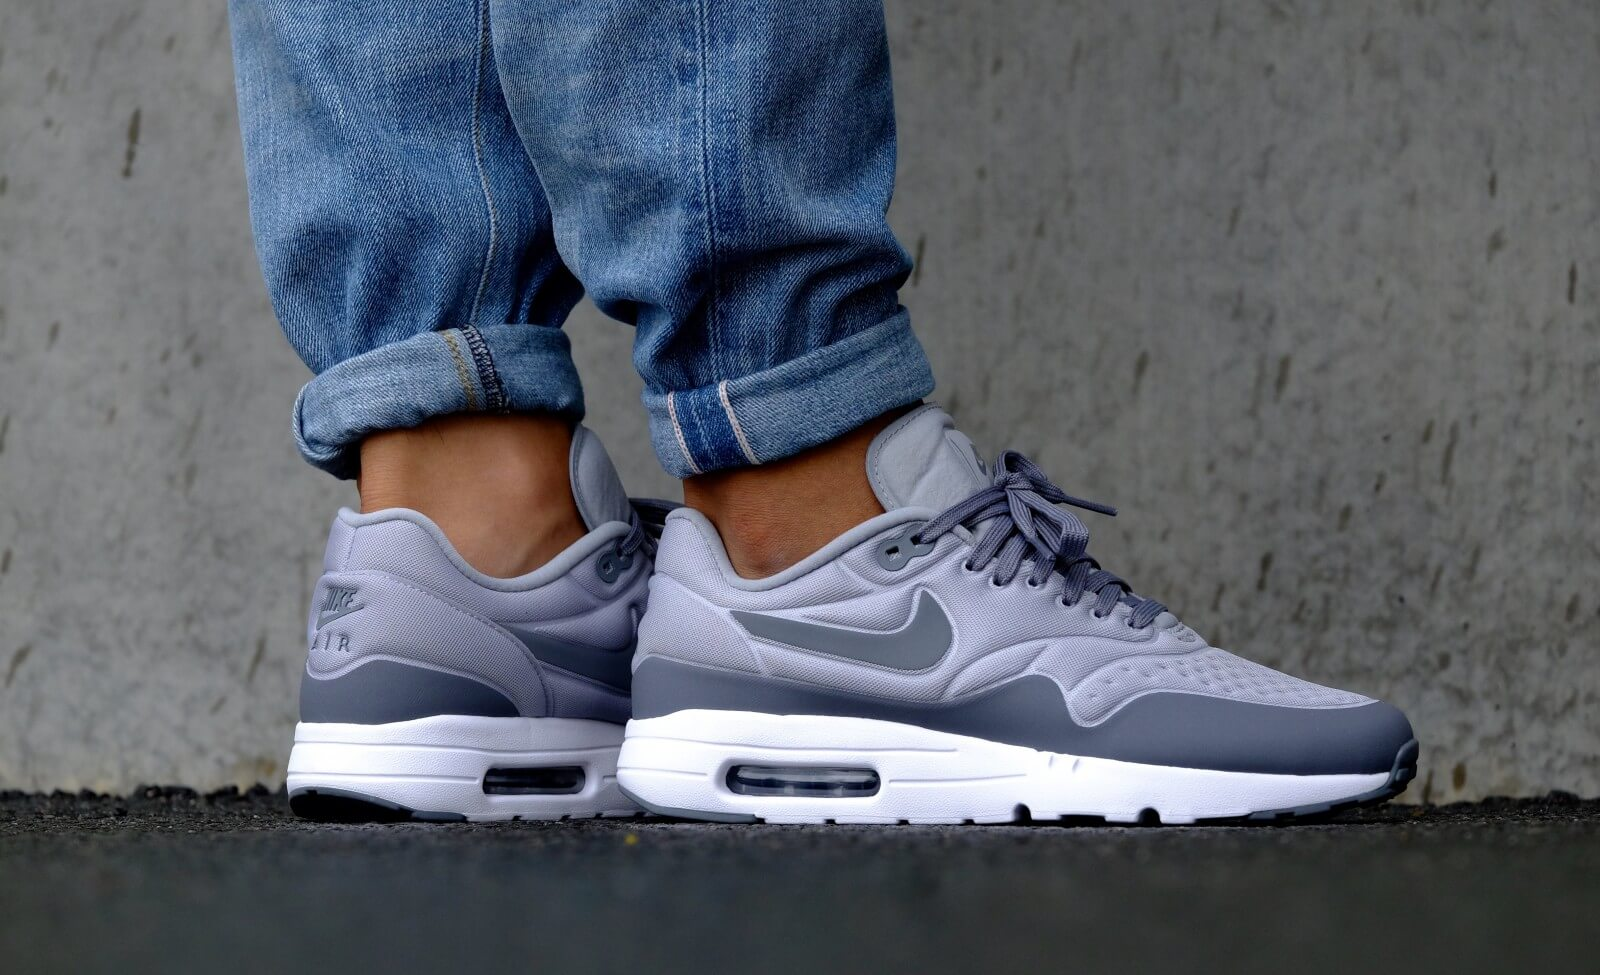 Nike Air Max 1 SE 'Wolf Grey' | AO1021 002 | Sneakerjagers